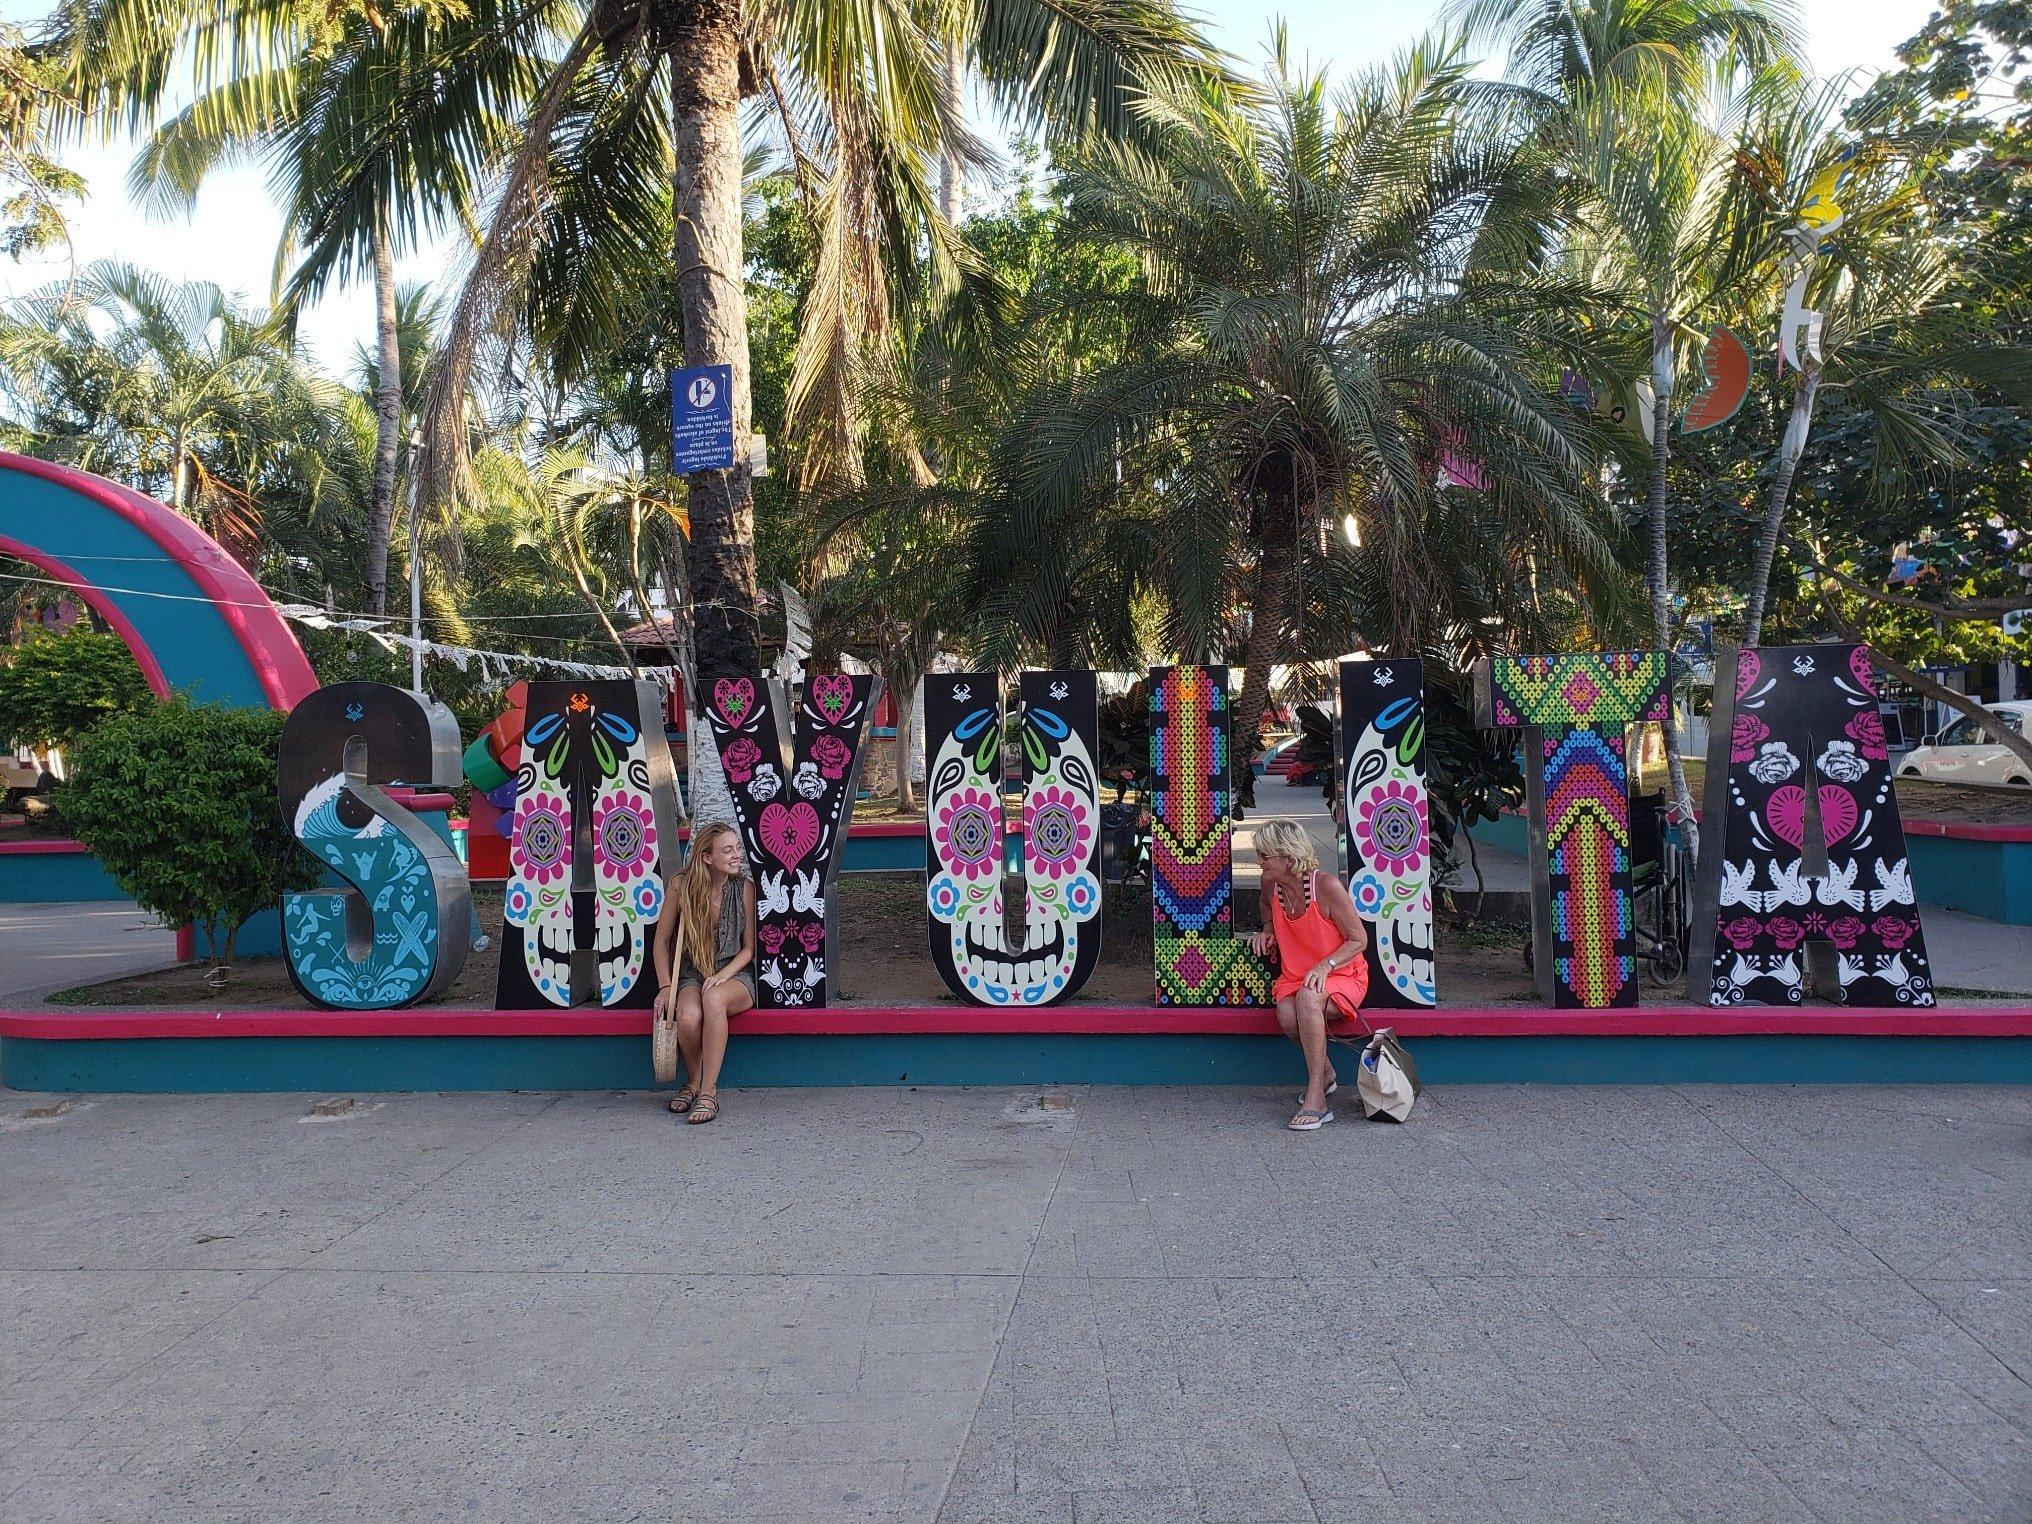 La Plaza Principal in Sayulita, Mexico